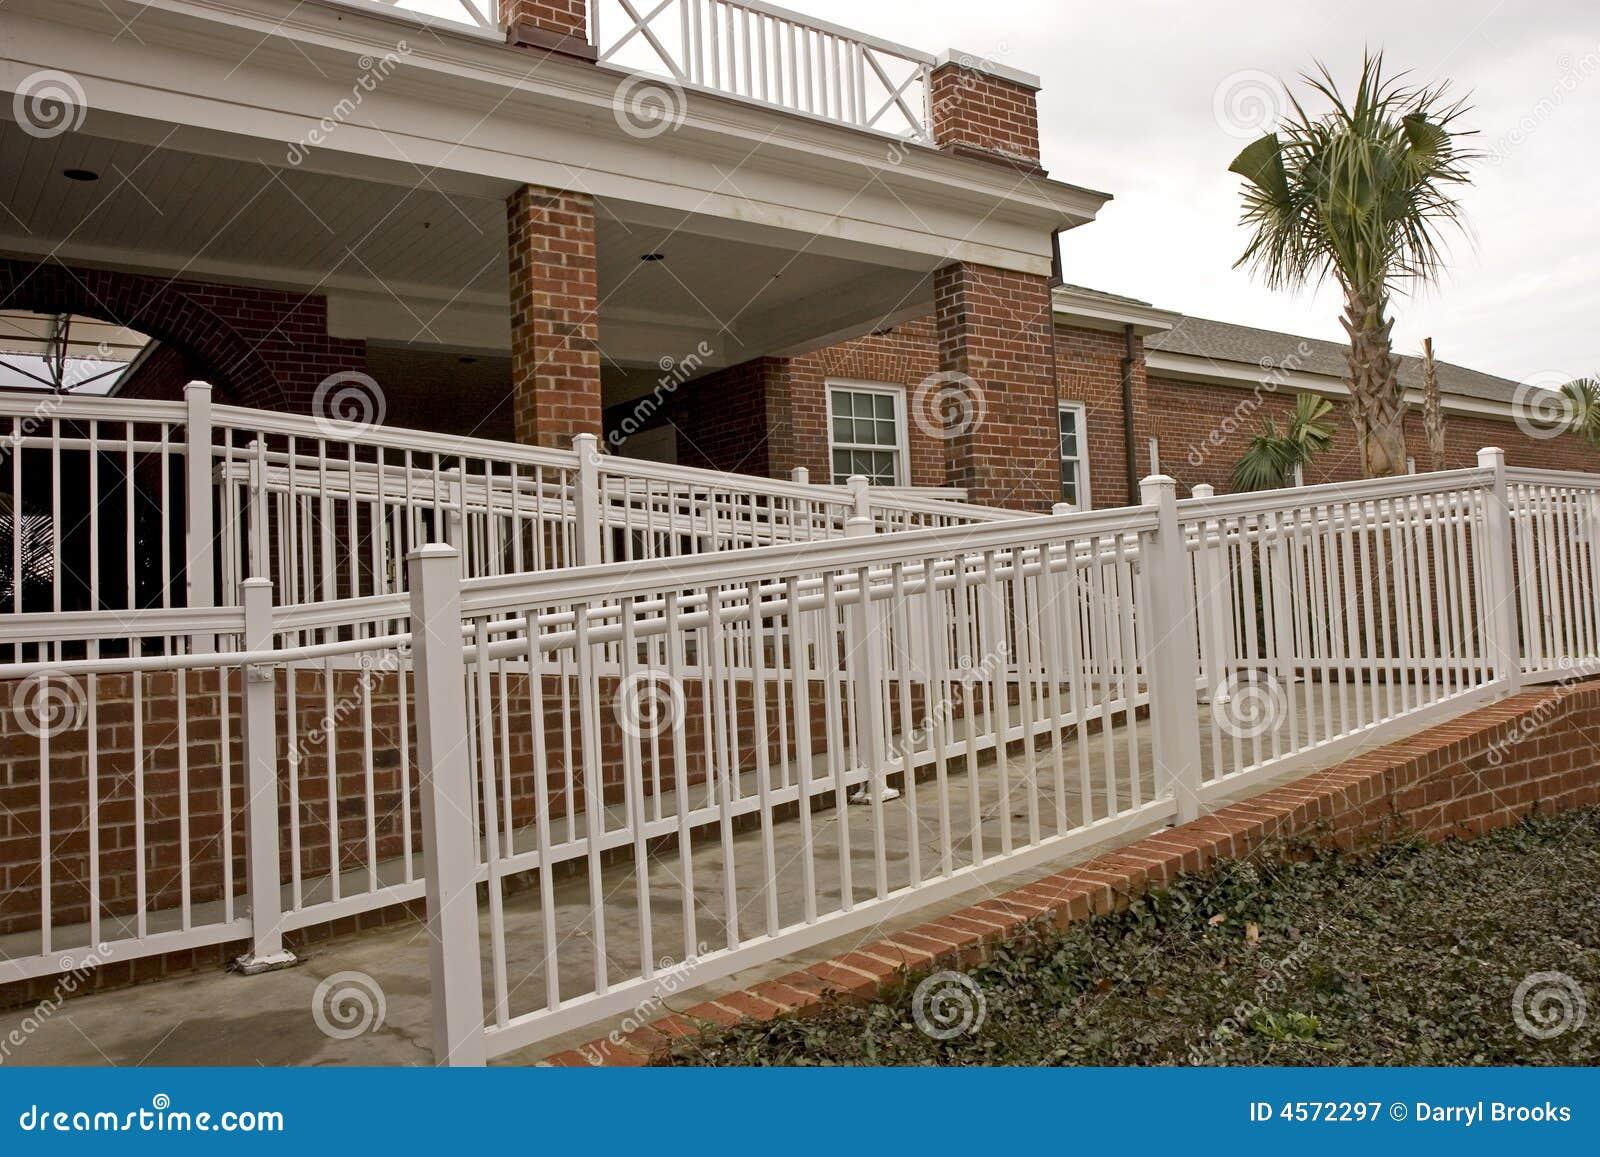 brick handicap ramp stock image image of ramp disability 4572297. Black Bedroom Furniture Sets. Home Design Ideas